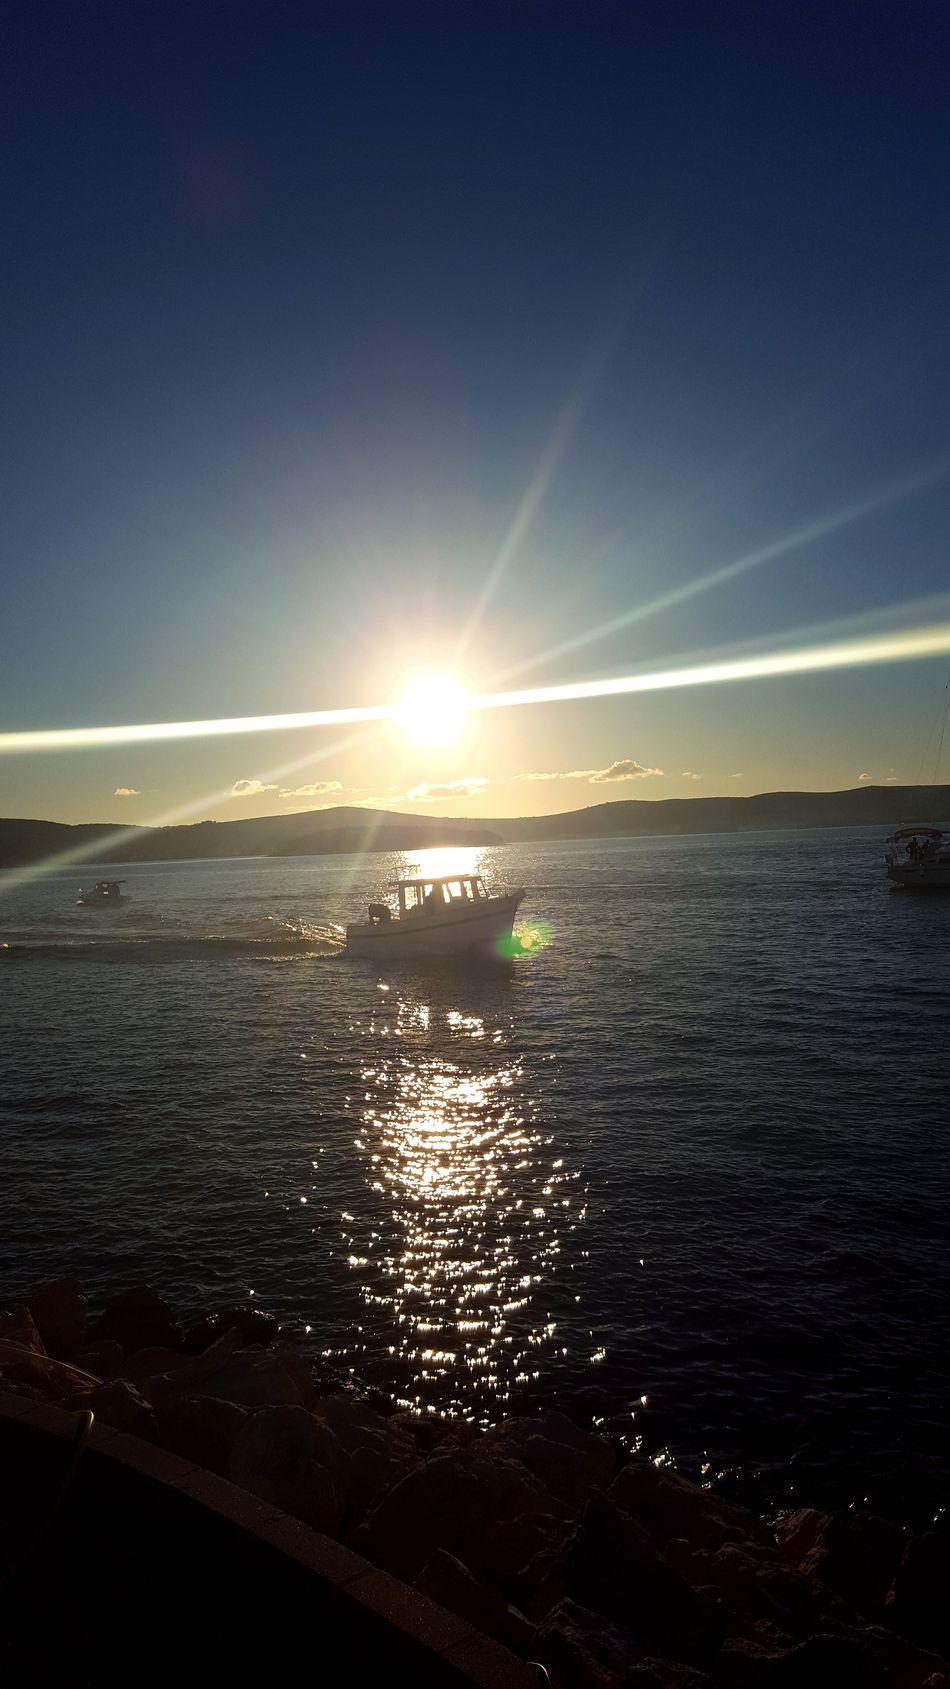 Nature Sky Sea Beauty In Nature Scenics Sunlight Horizon Over Water Outdoors Idyllic Tranquil Scene Sunbeam Water Sunset Yachting Nautical Vessel Sailing Sailing Ship